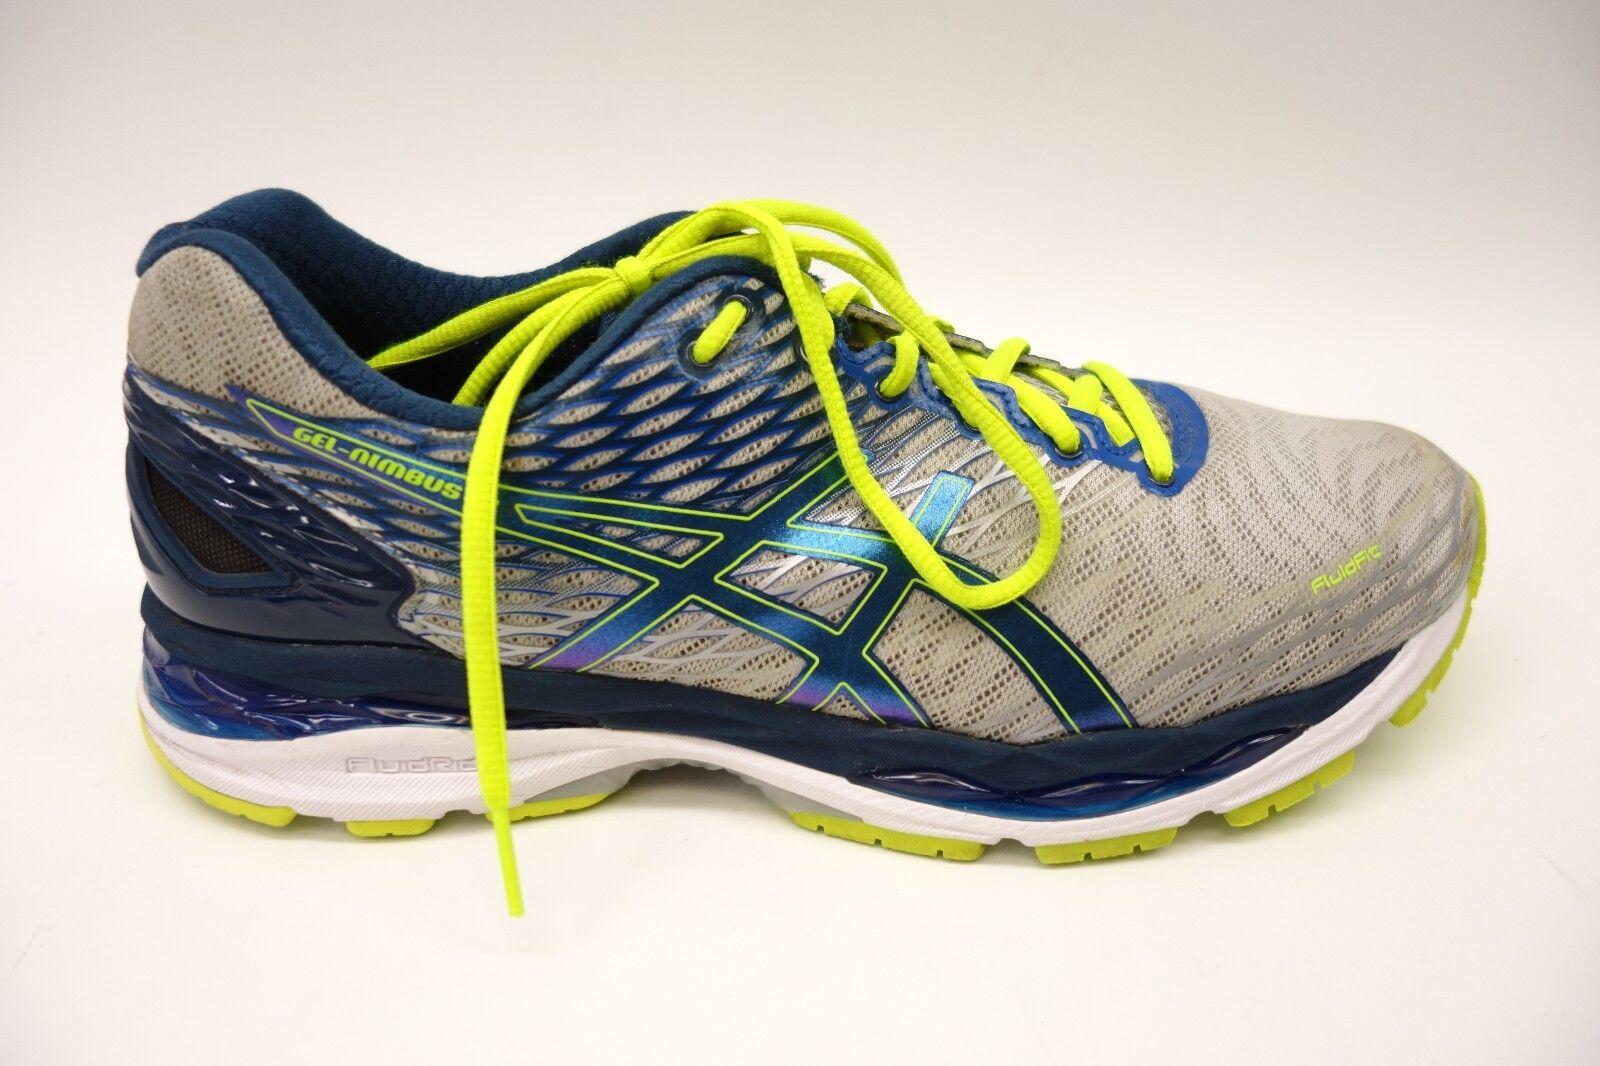 Asics hommes Gel-Nimbus 18 T600N Athletic Athletic T600N Cross Training Running Chaussures 7d31c0